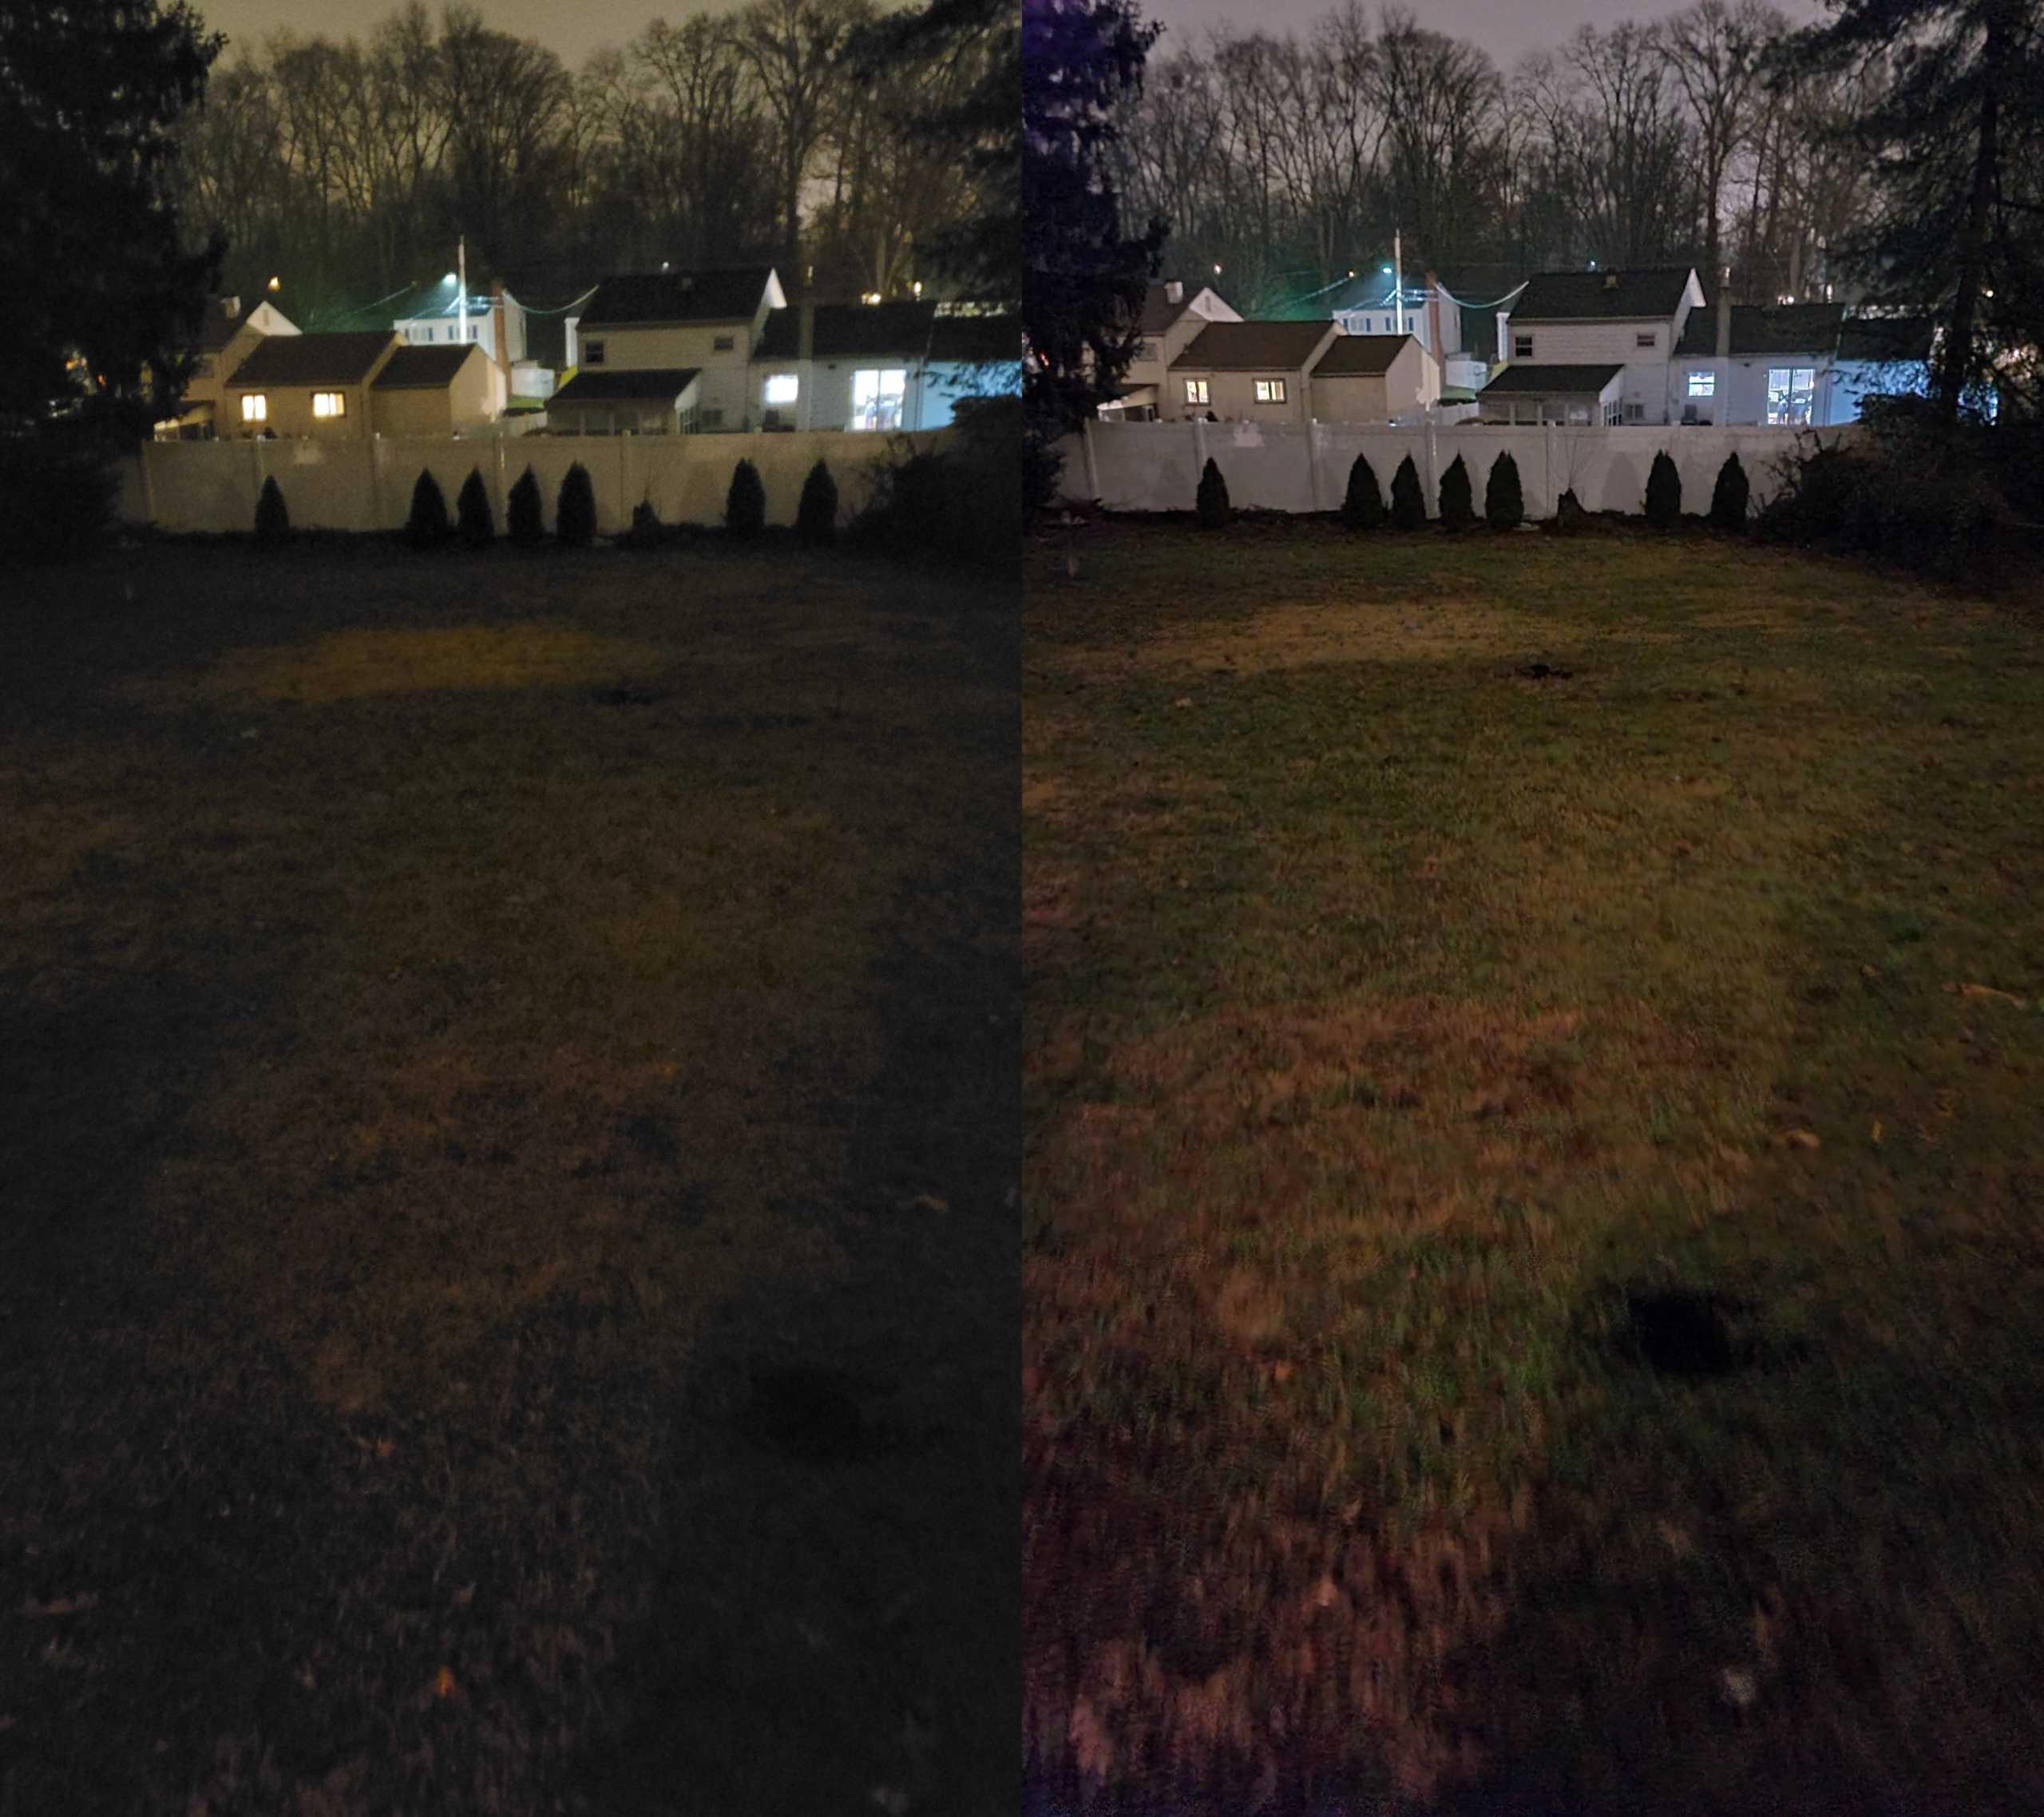 Samsung GALAXY S20 Plus vs S10 exterior